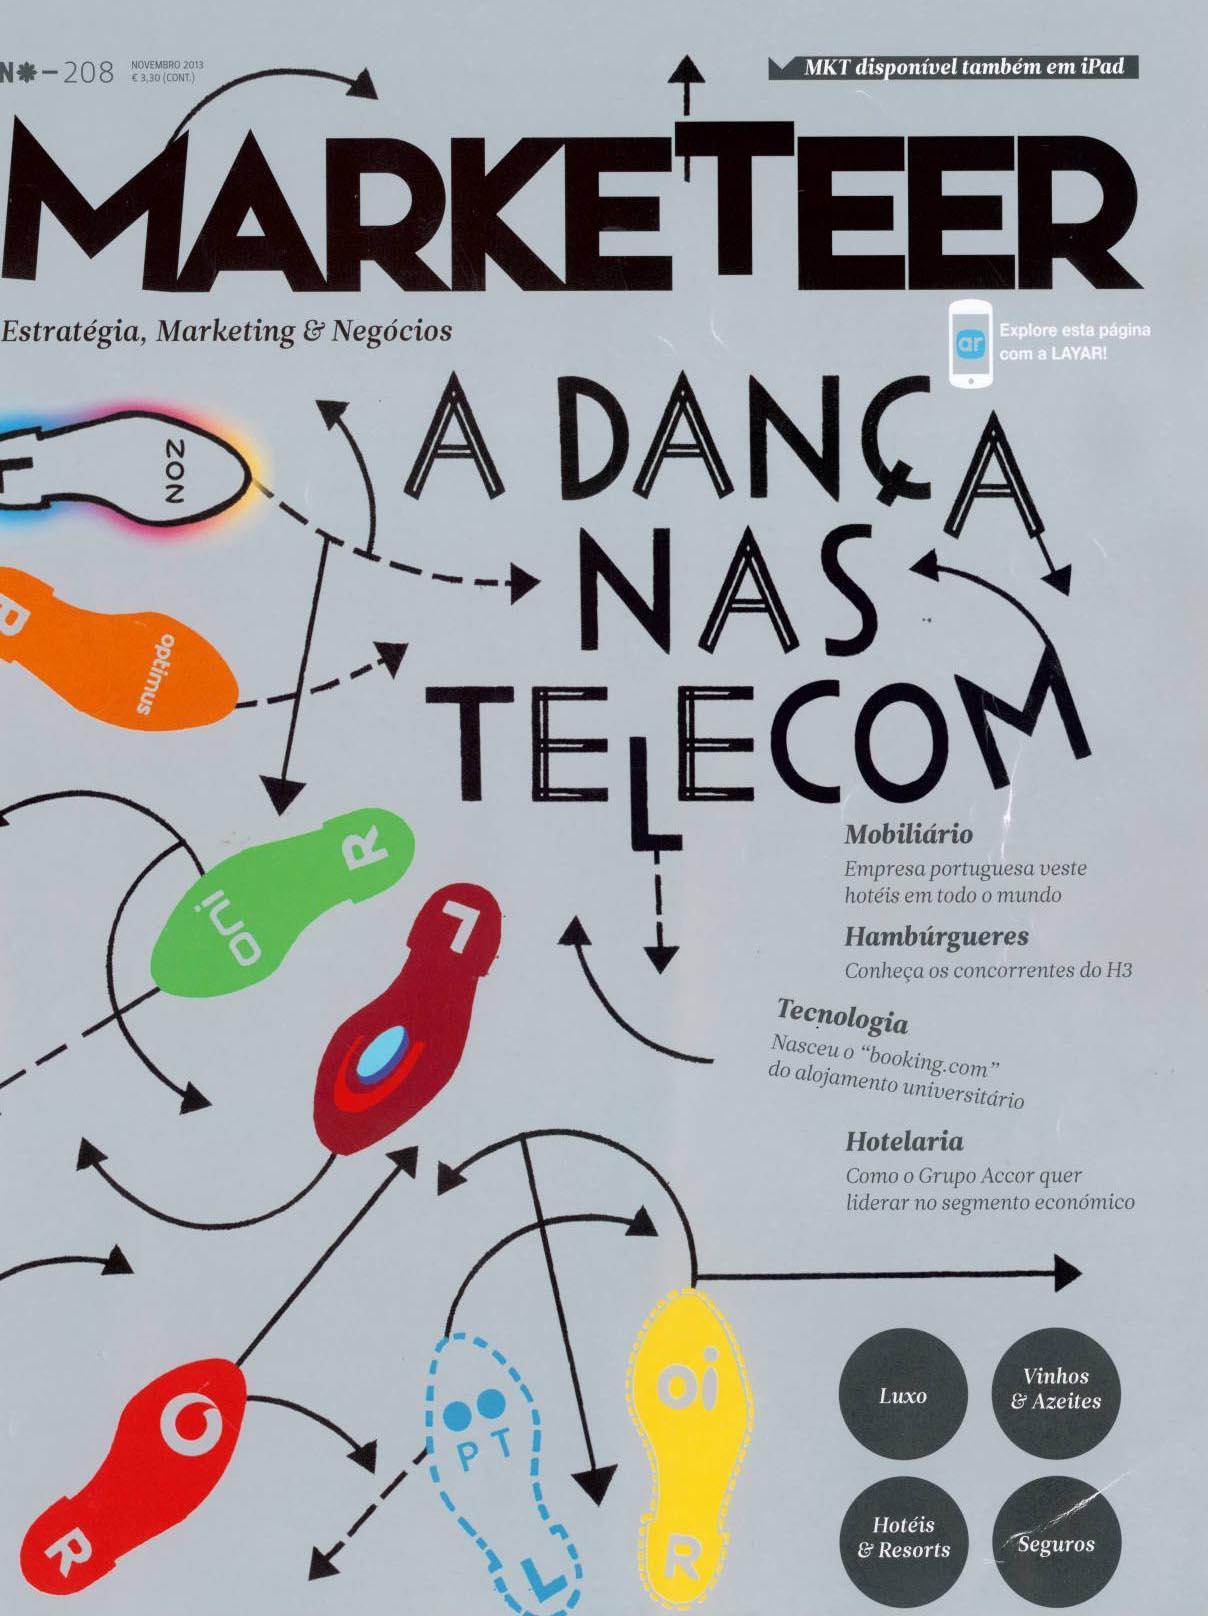 6 - marketeer capa1.jpg